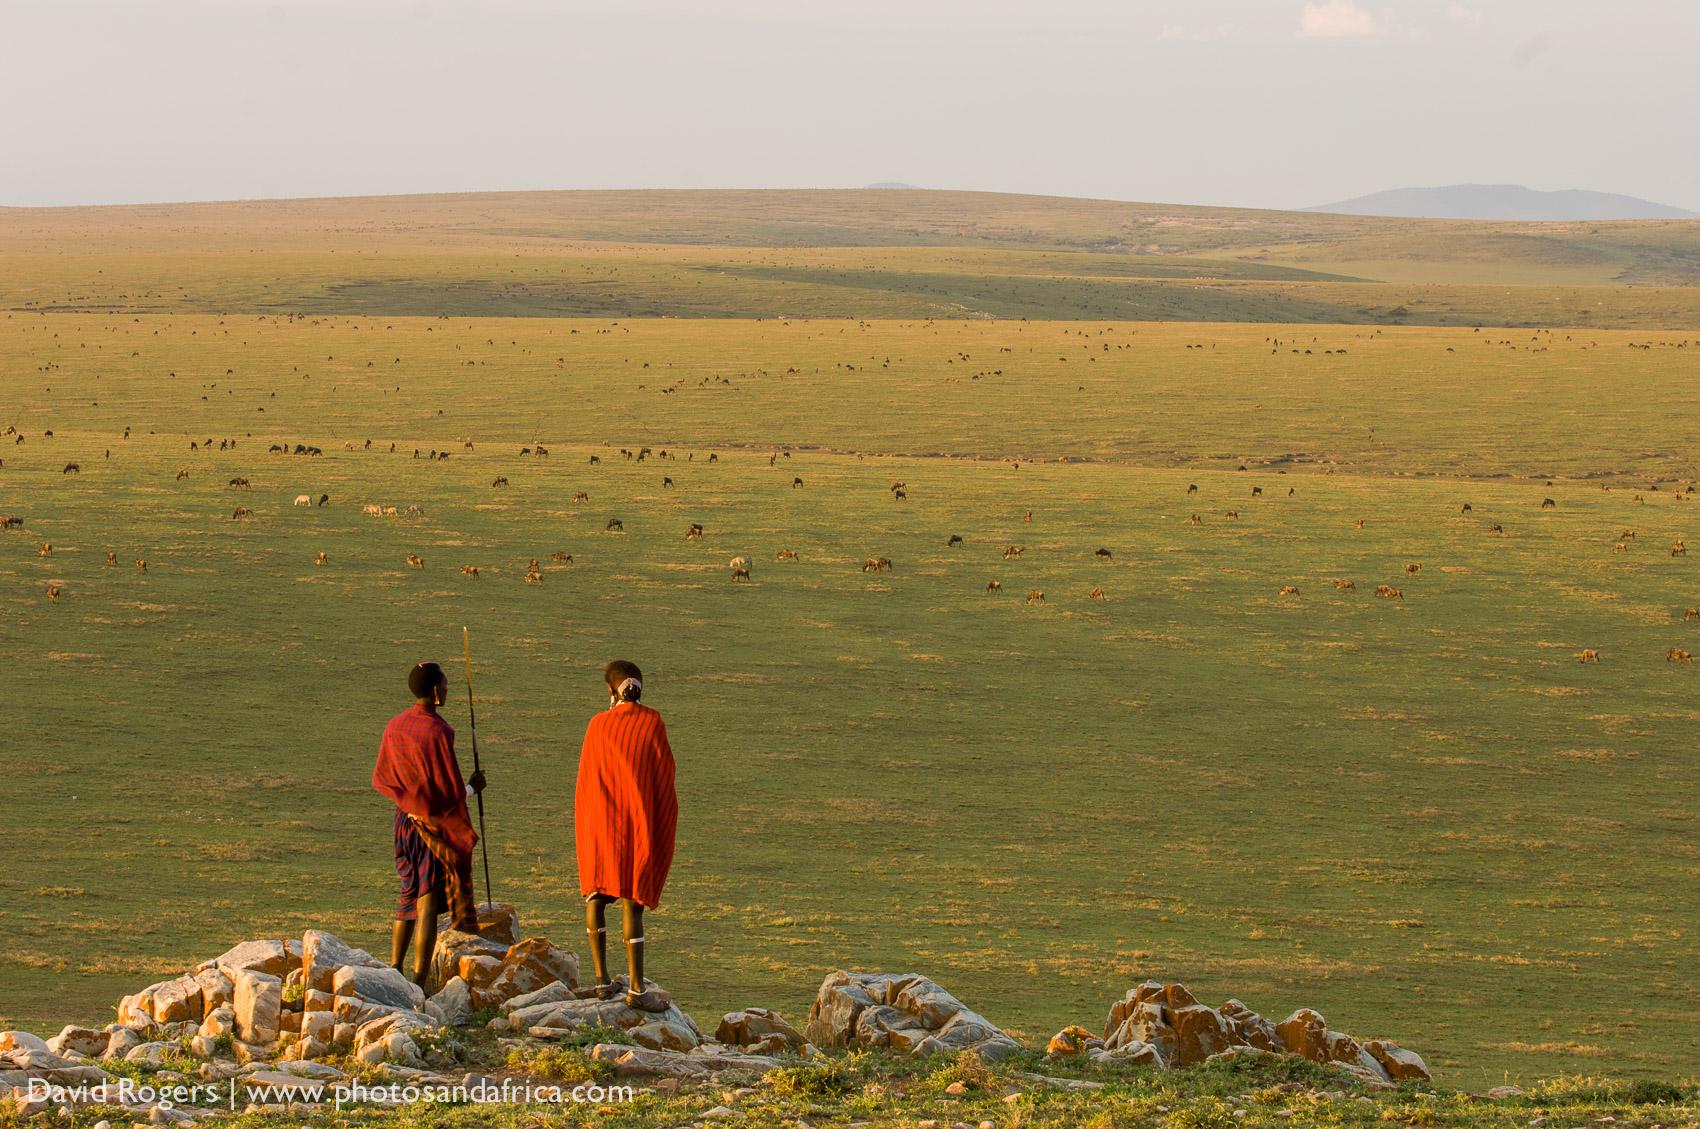 Tanzania, Serengeti, Loliondo region ©David Rogers